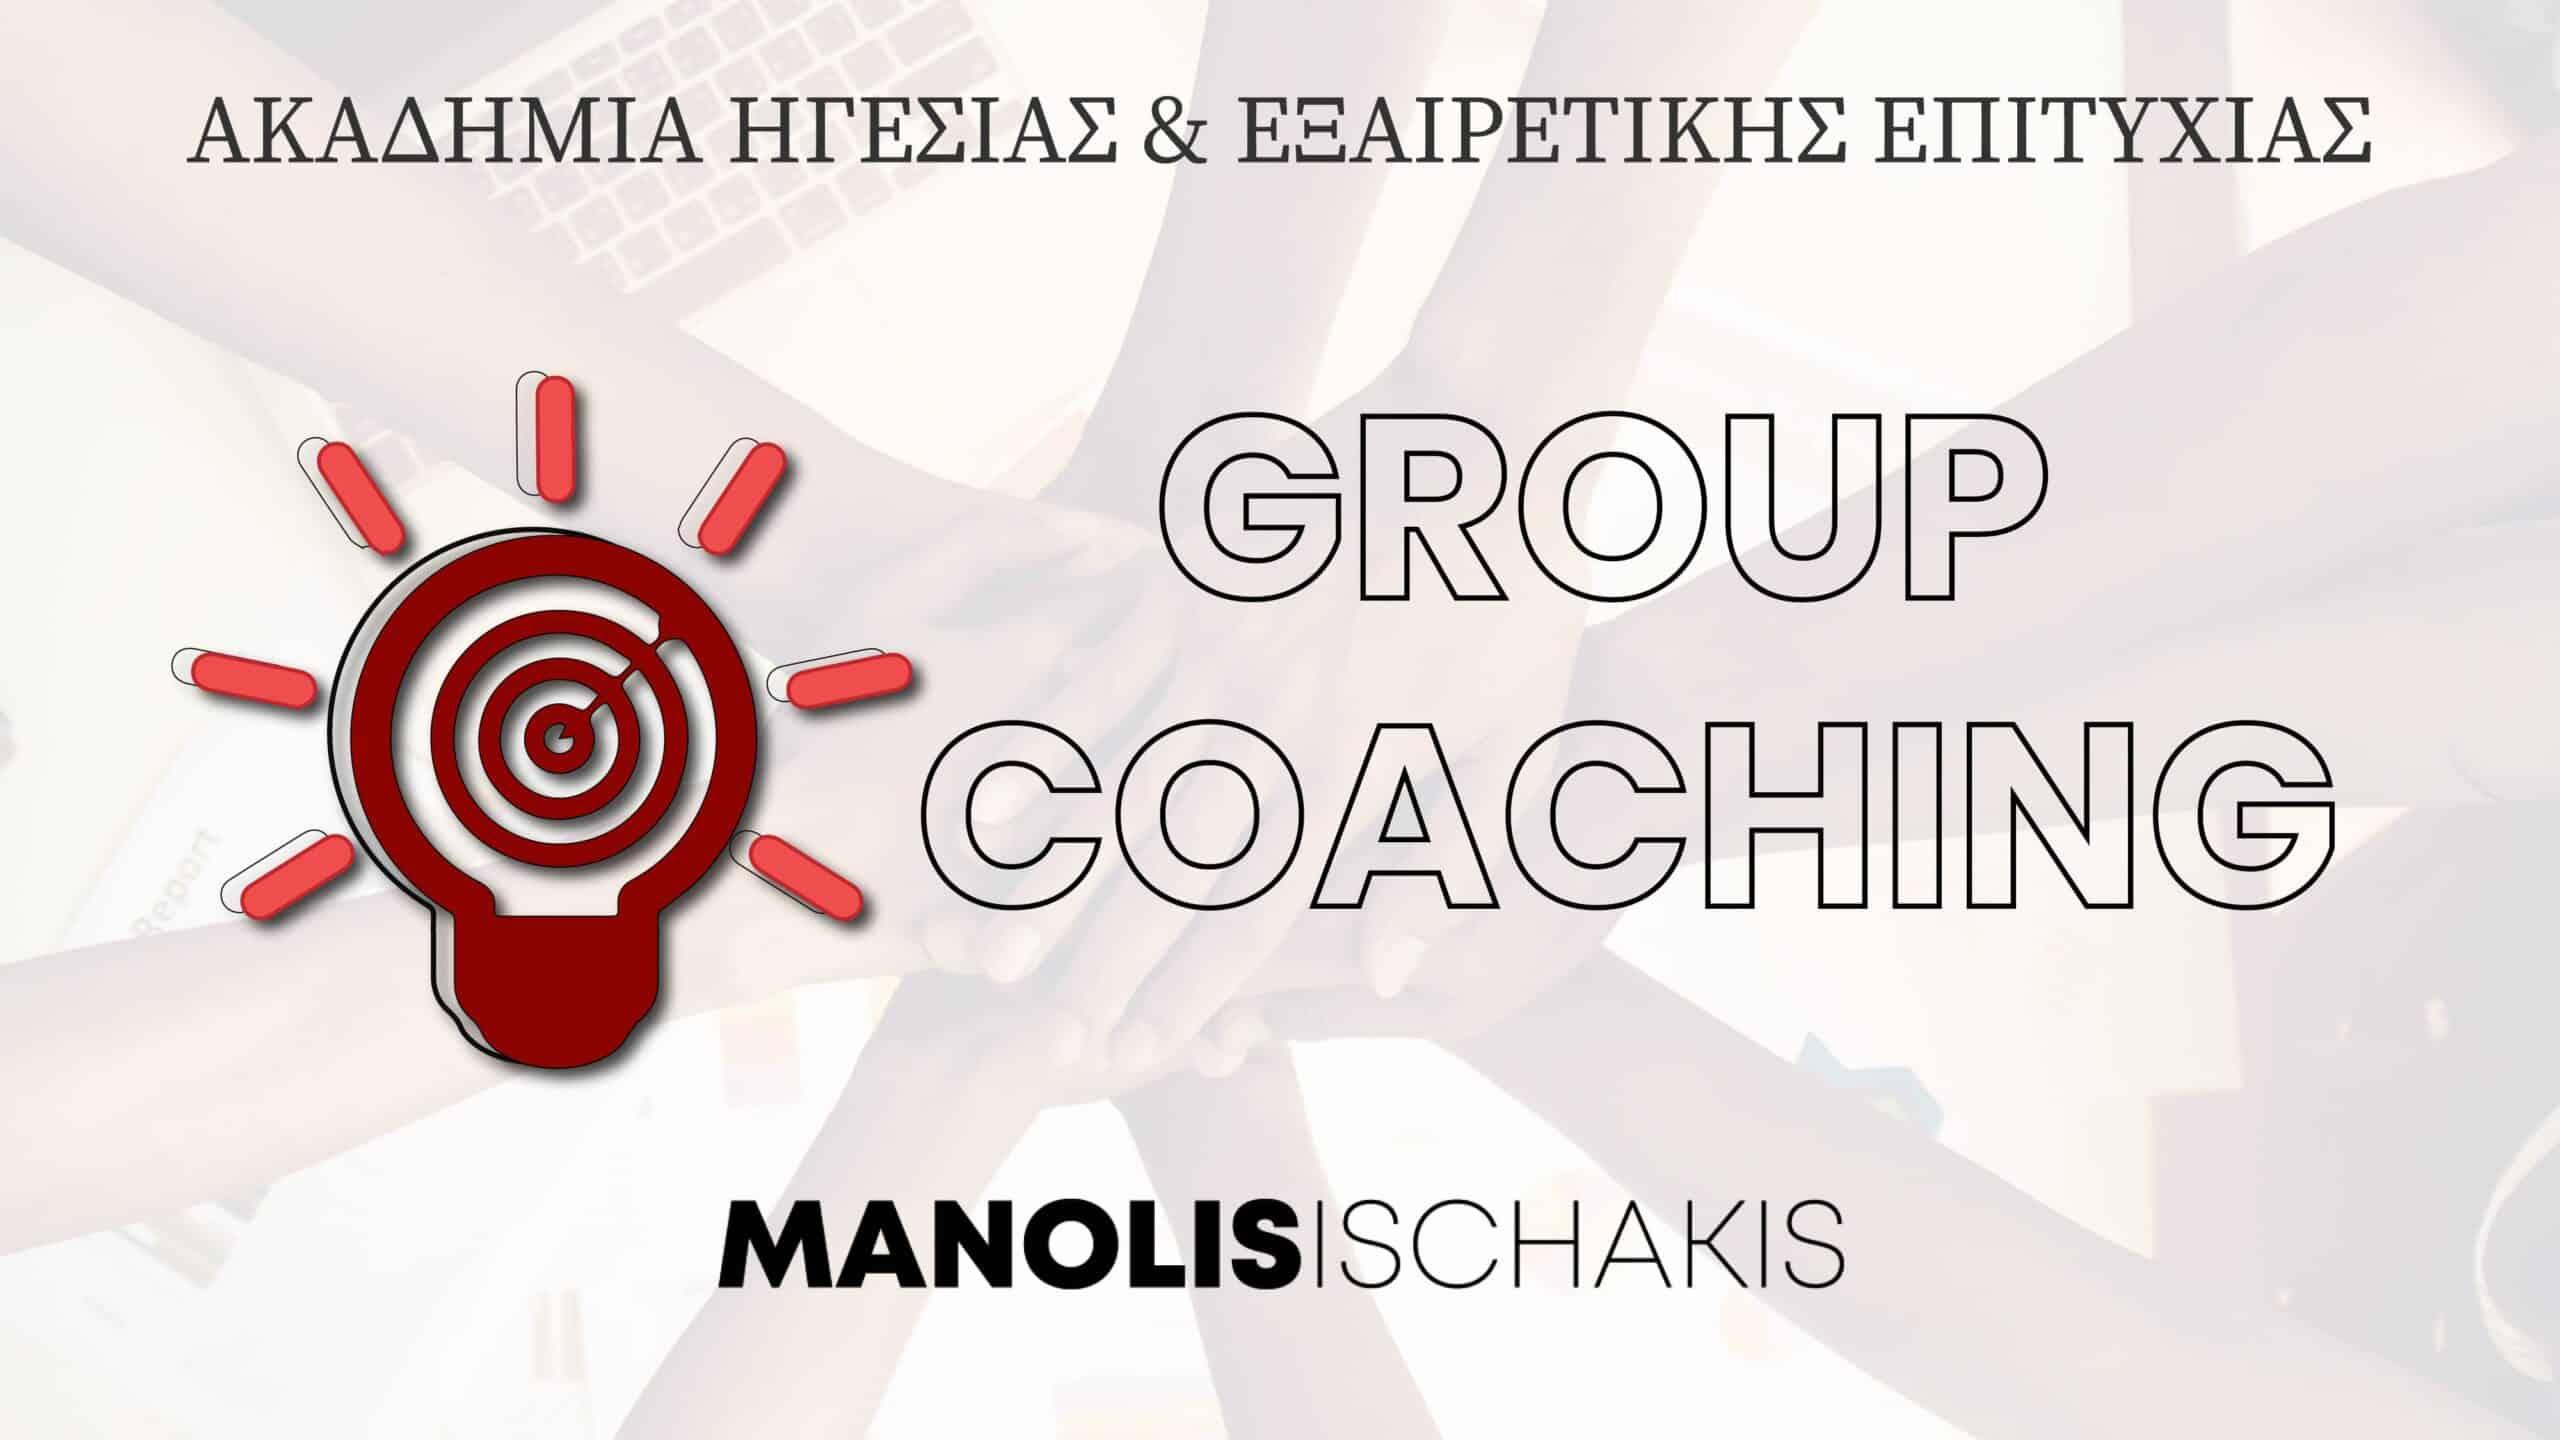 Group Coaching Manolis Ischakis